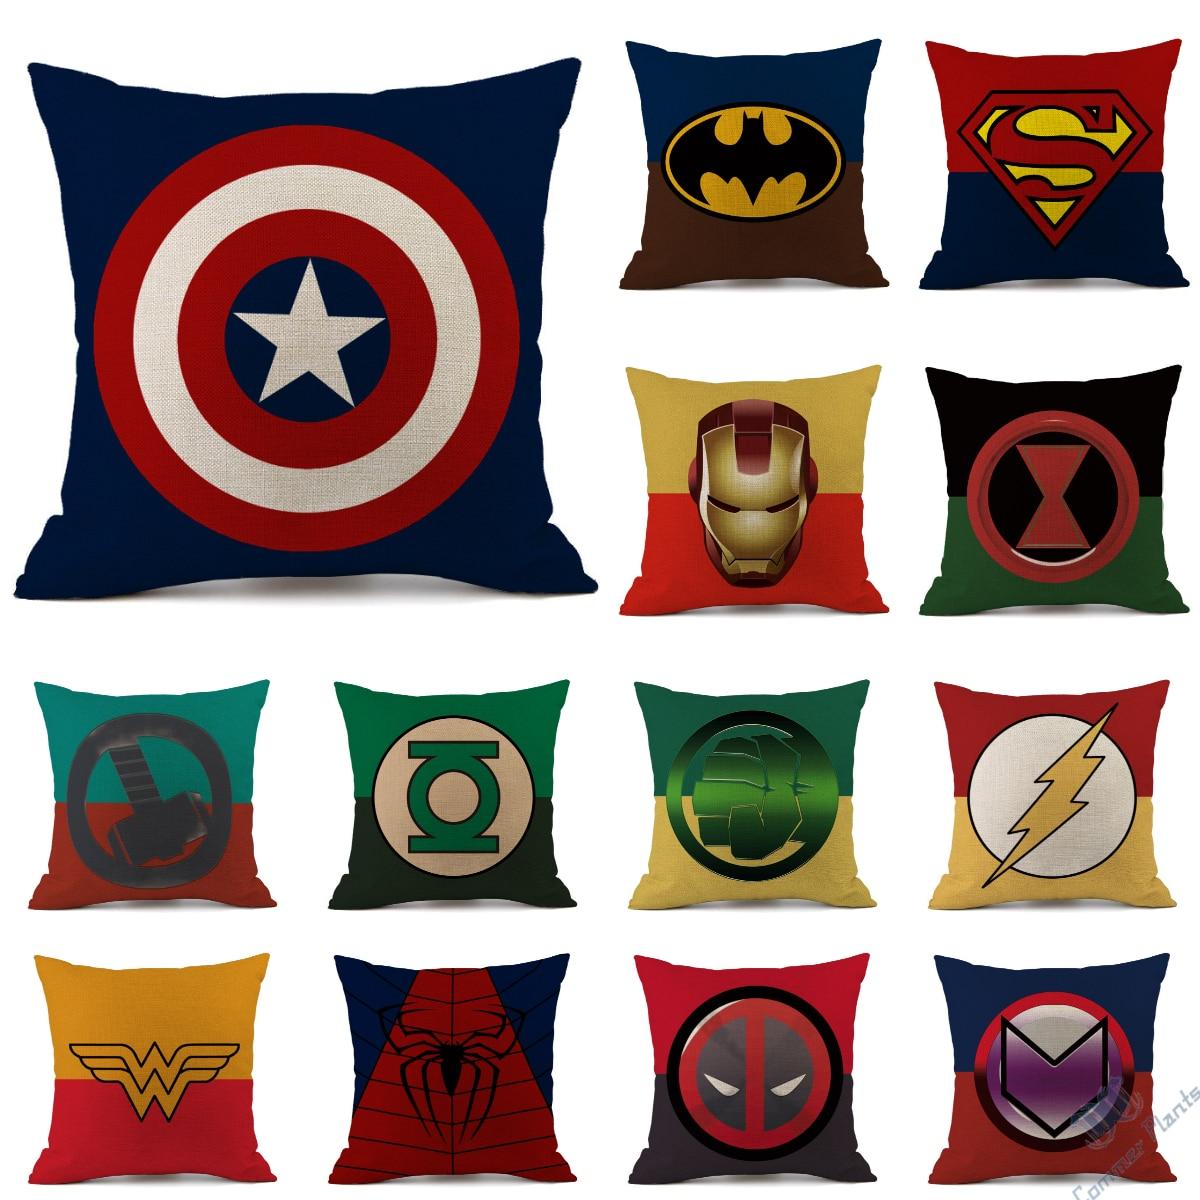 Tema de súper héroe de dibujos animados vengadores cojín cubierta caliente Superman, Spiderman Hombre Murciélago hombre capitán funda Marvel logotipo sofá almohada